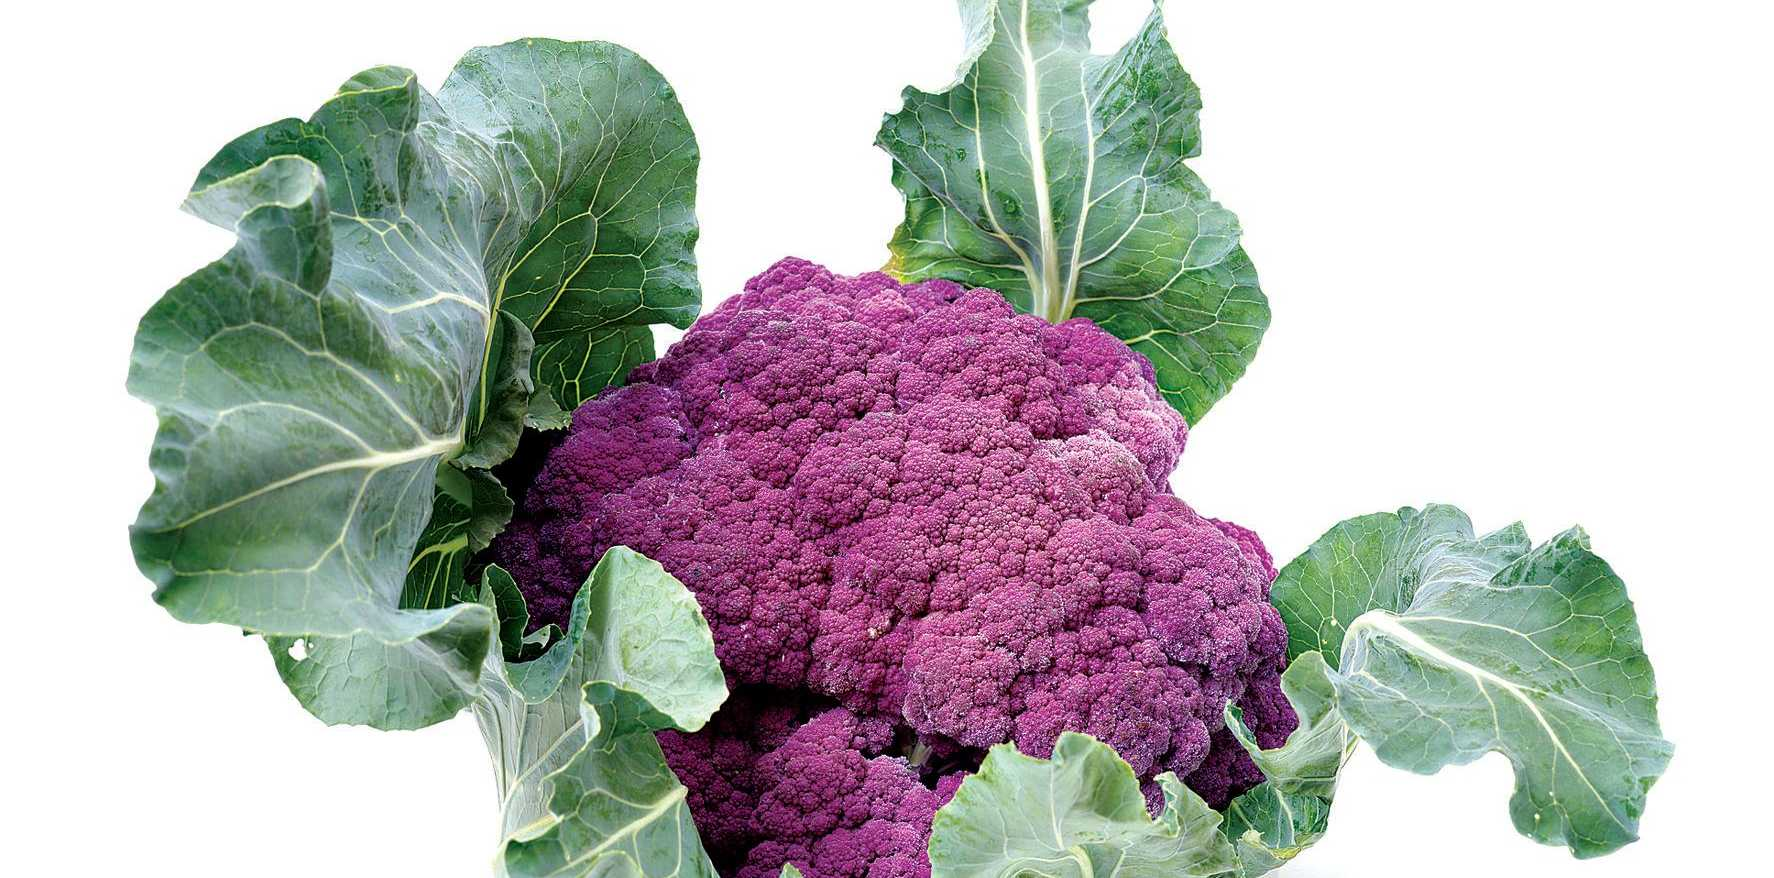 Get your garden in a purple patch with Violet Sicilian cauliflower.